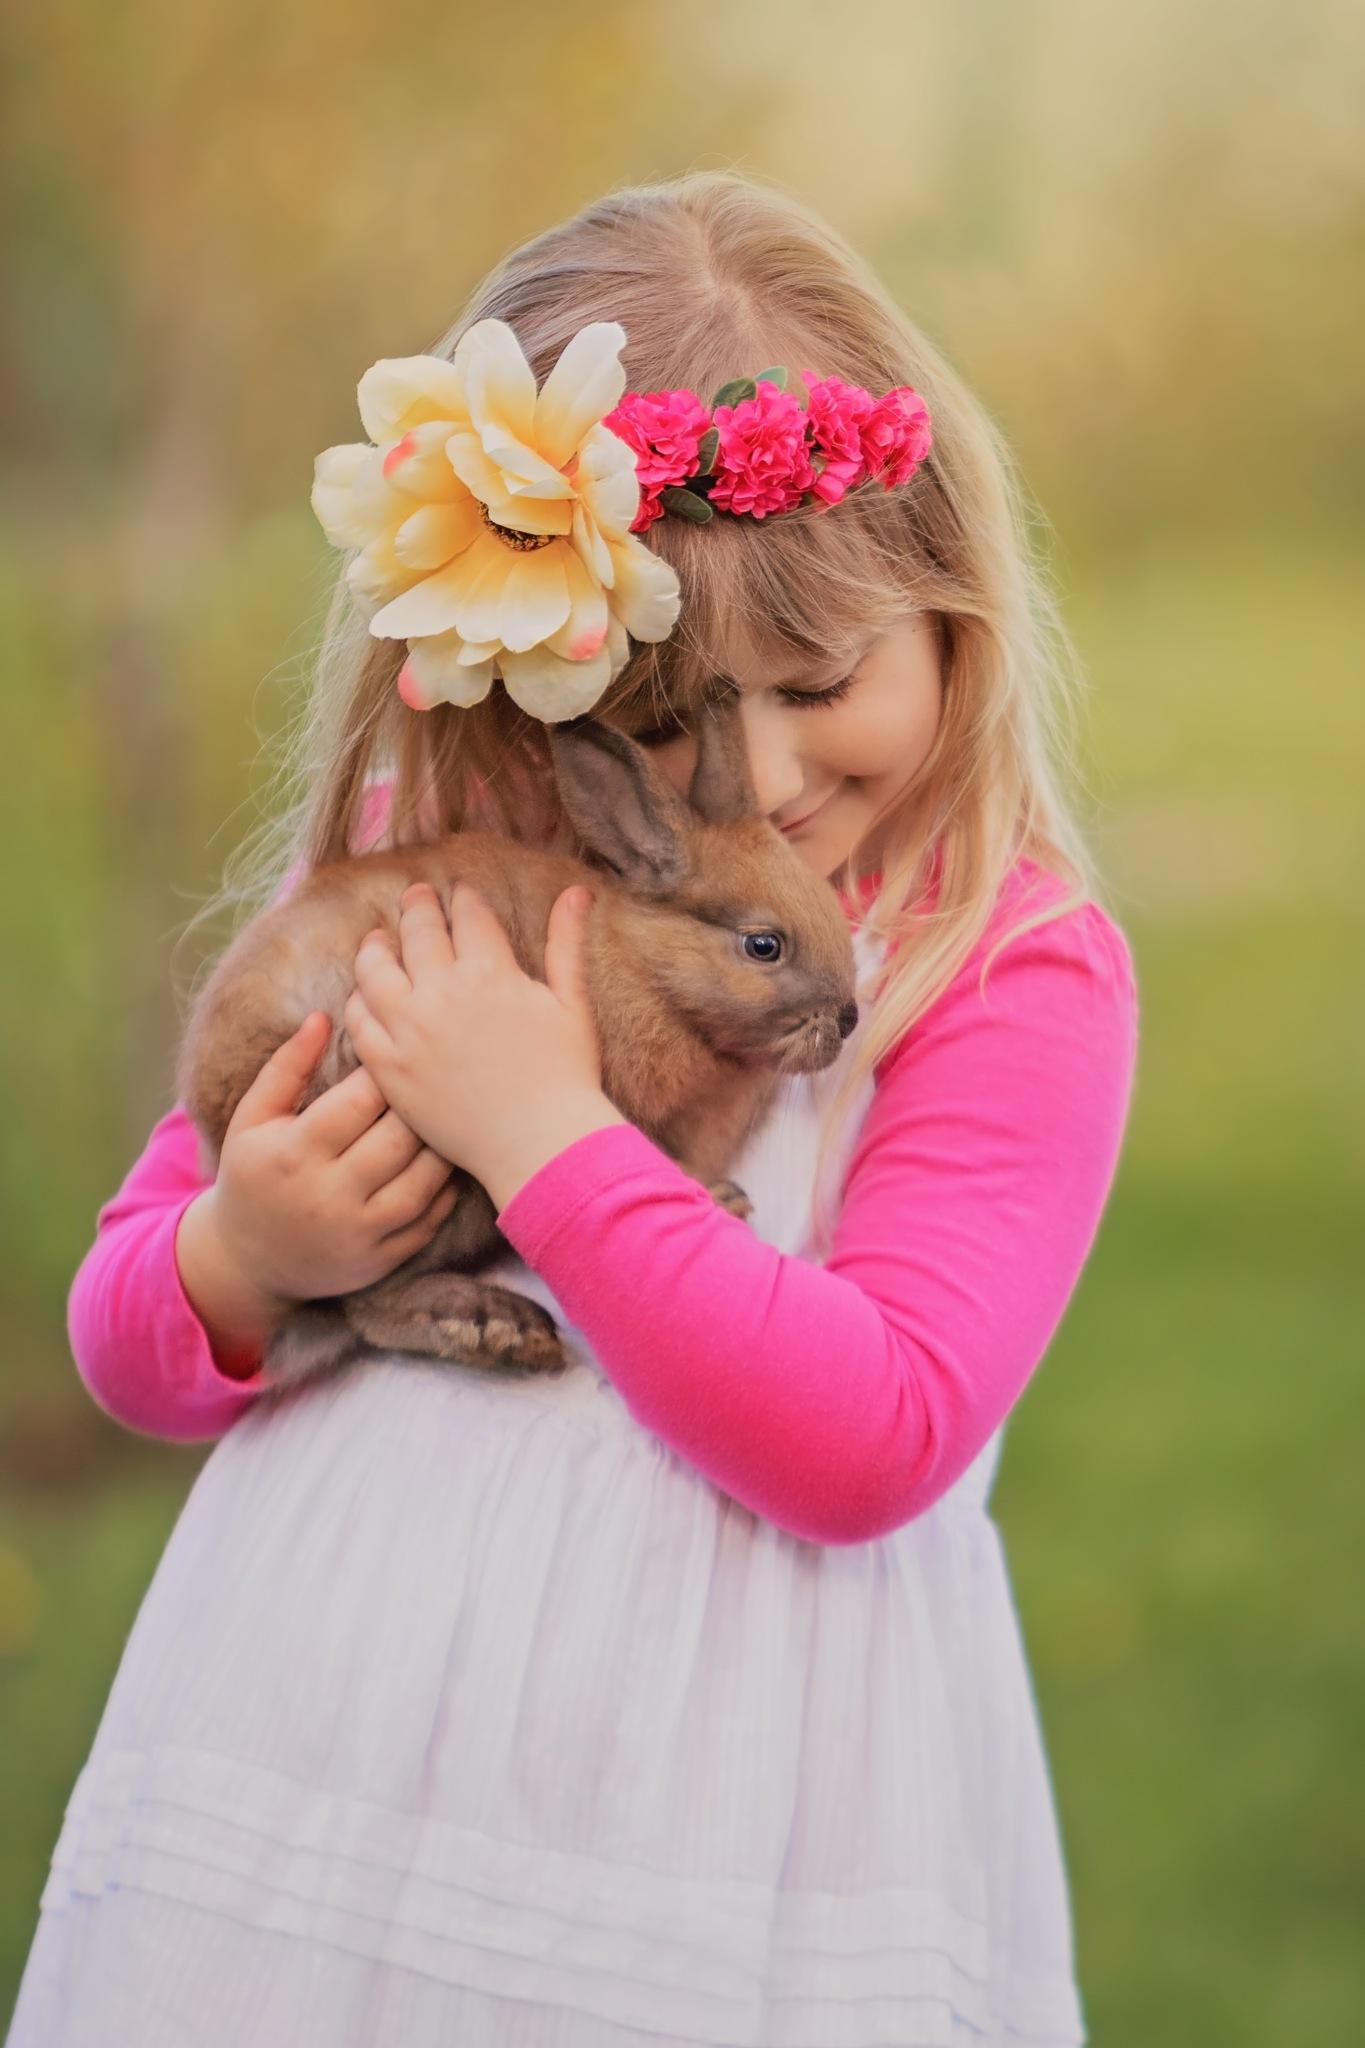 Spring childhood by zdenka.photo